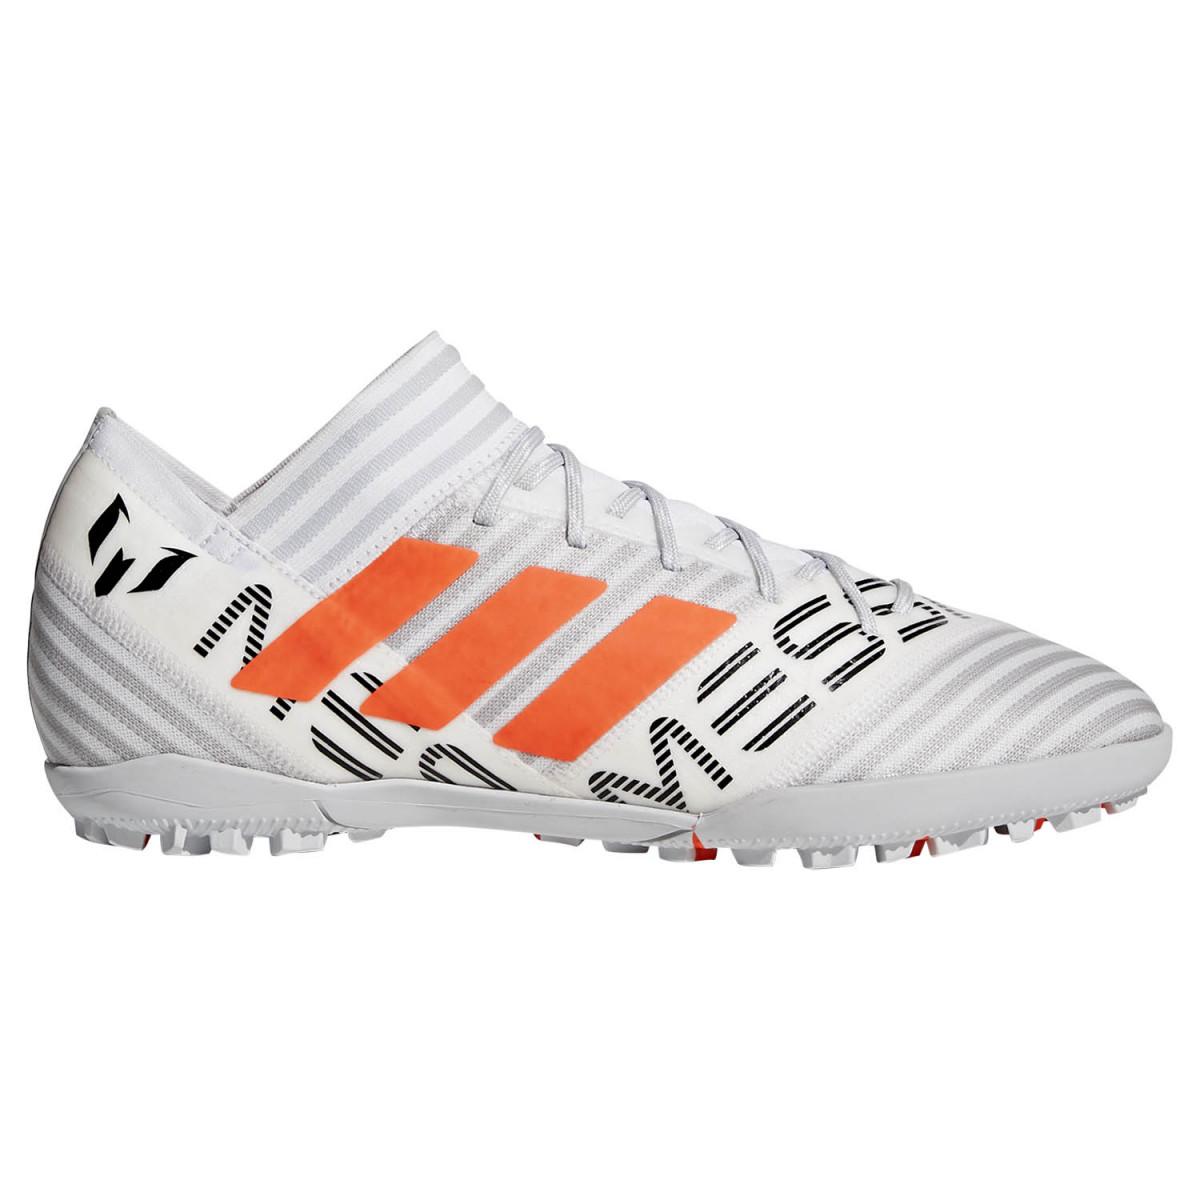 wholesale dealer 0acd7 06c1a Botines Adidas Nemeziz Messi Tango 17.3 Tf